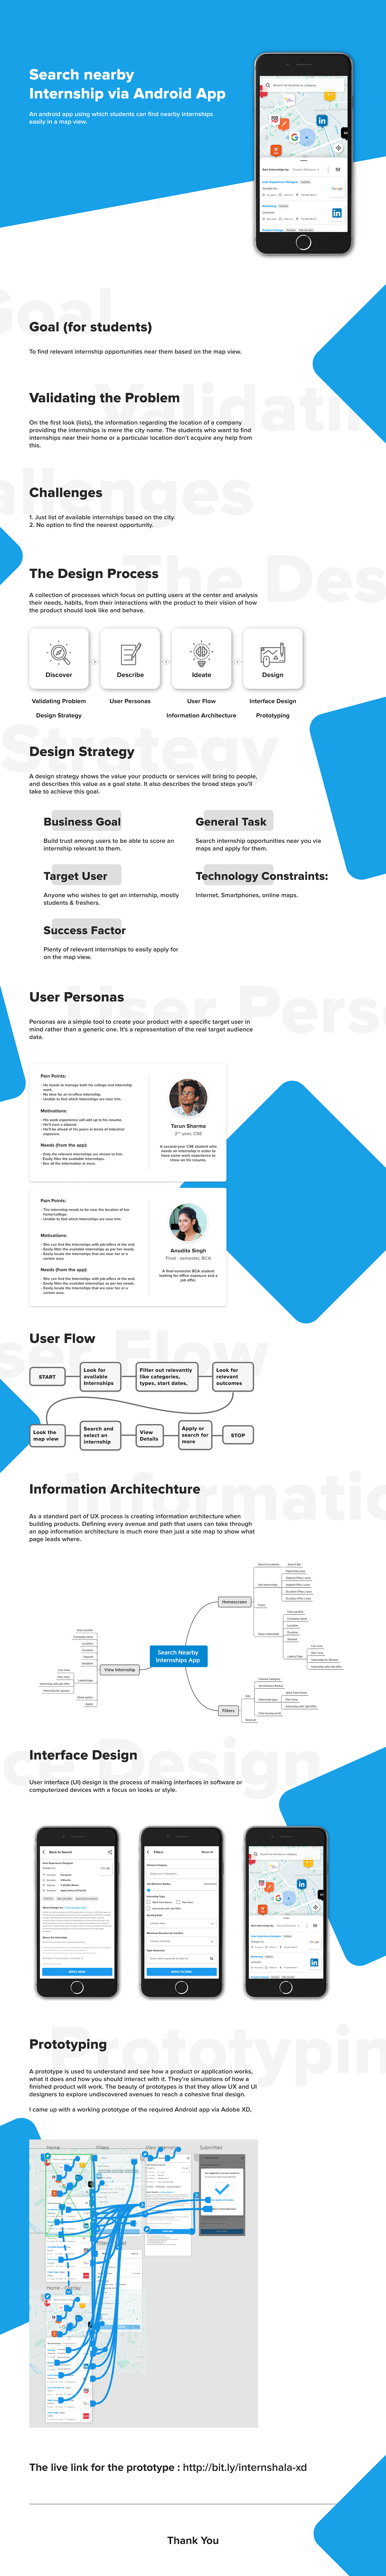 UI UX Design | Internship via Map App on Student Show